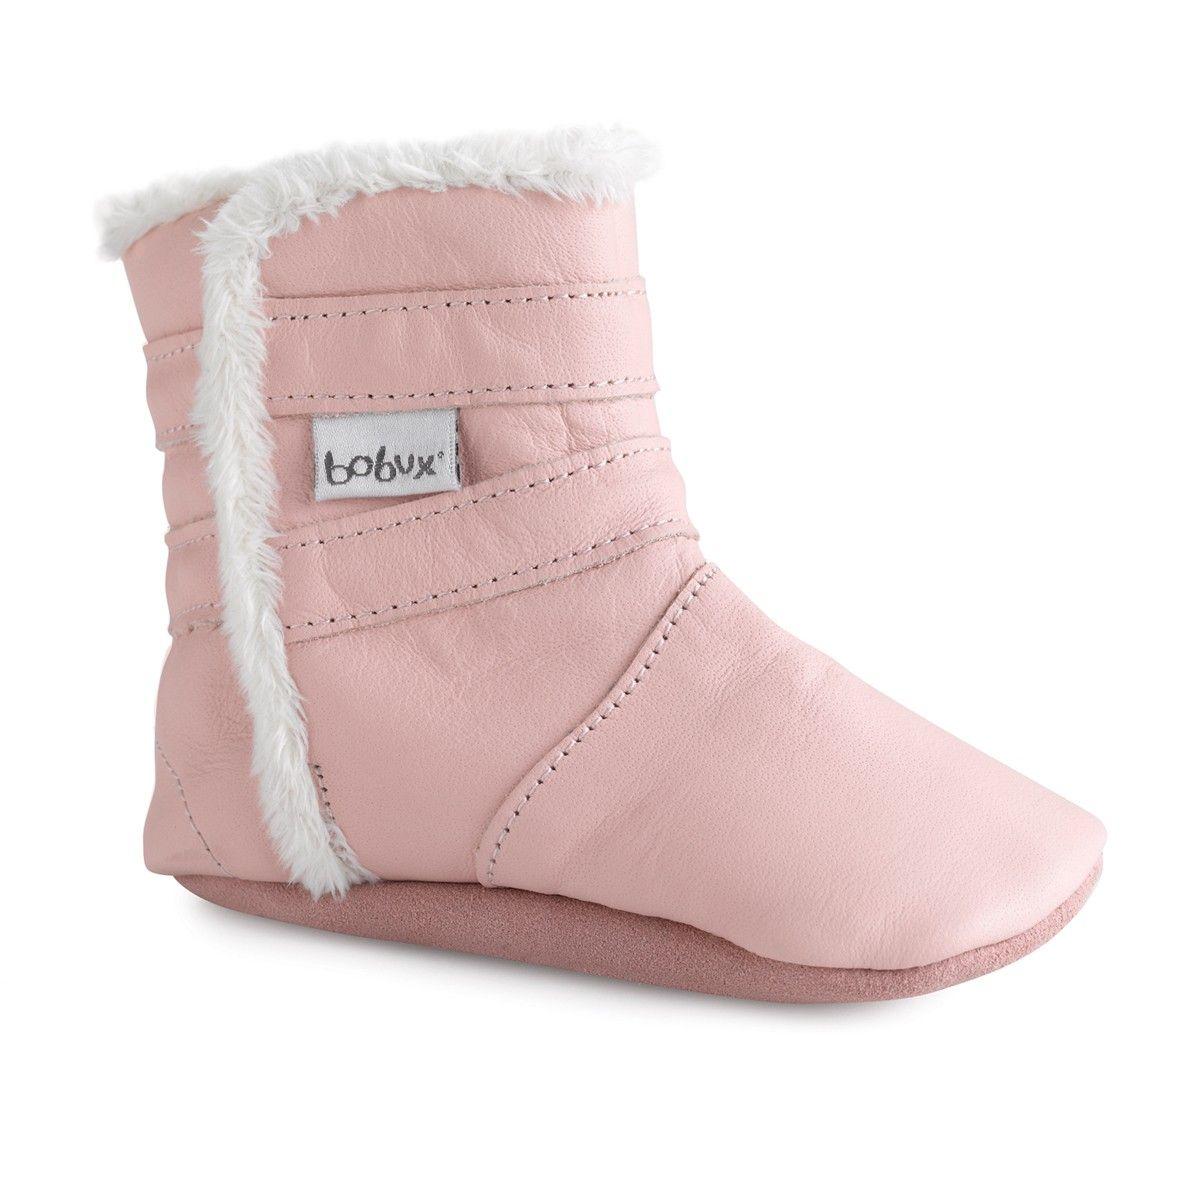 Sofe Sole pink boot $44.95NZ http://www.babystuff.co.nz